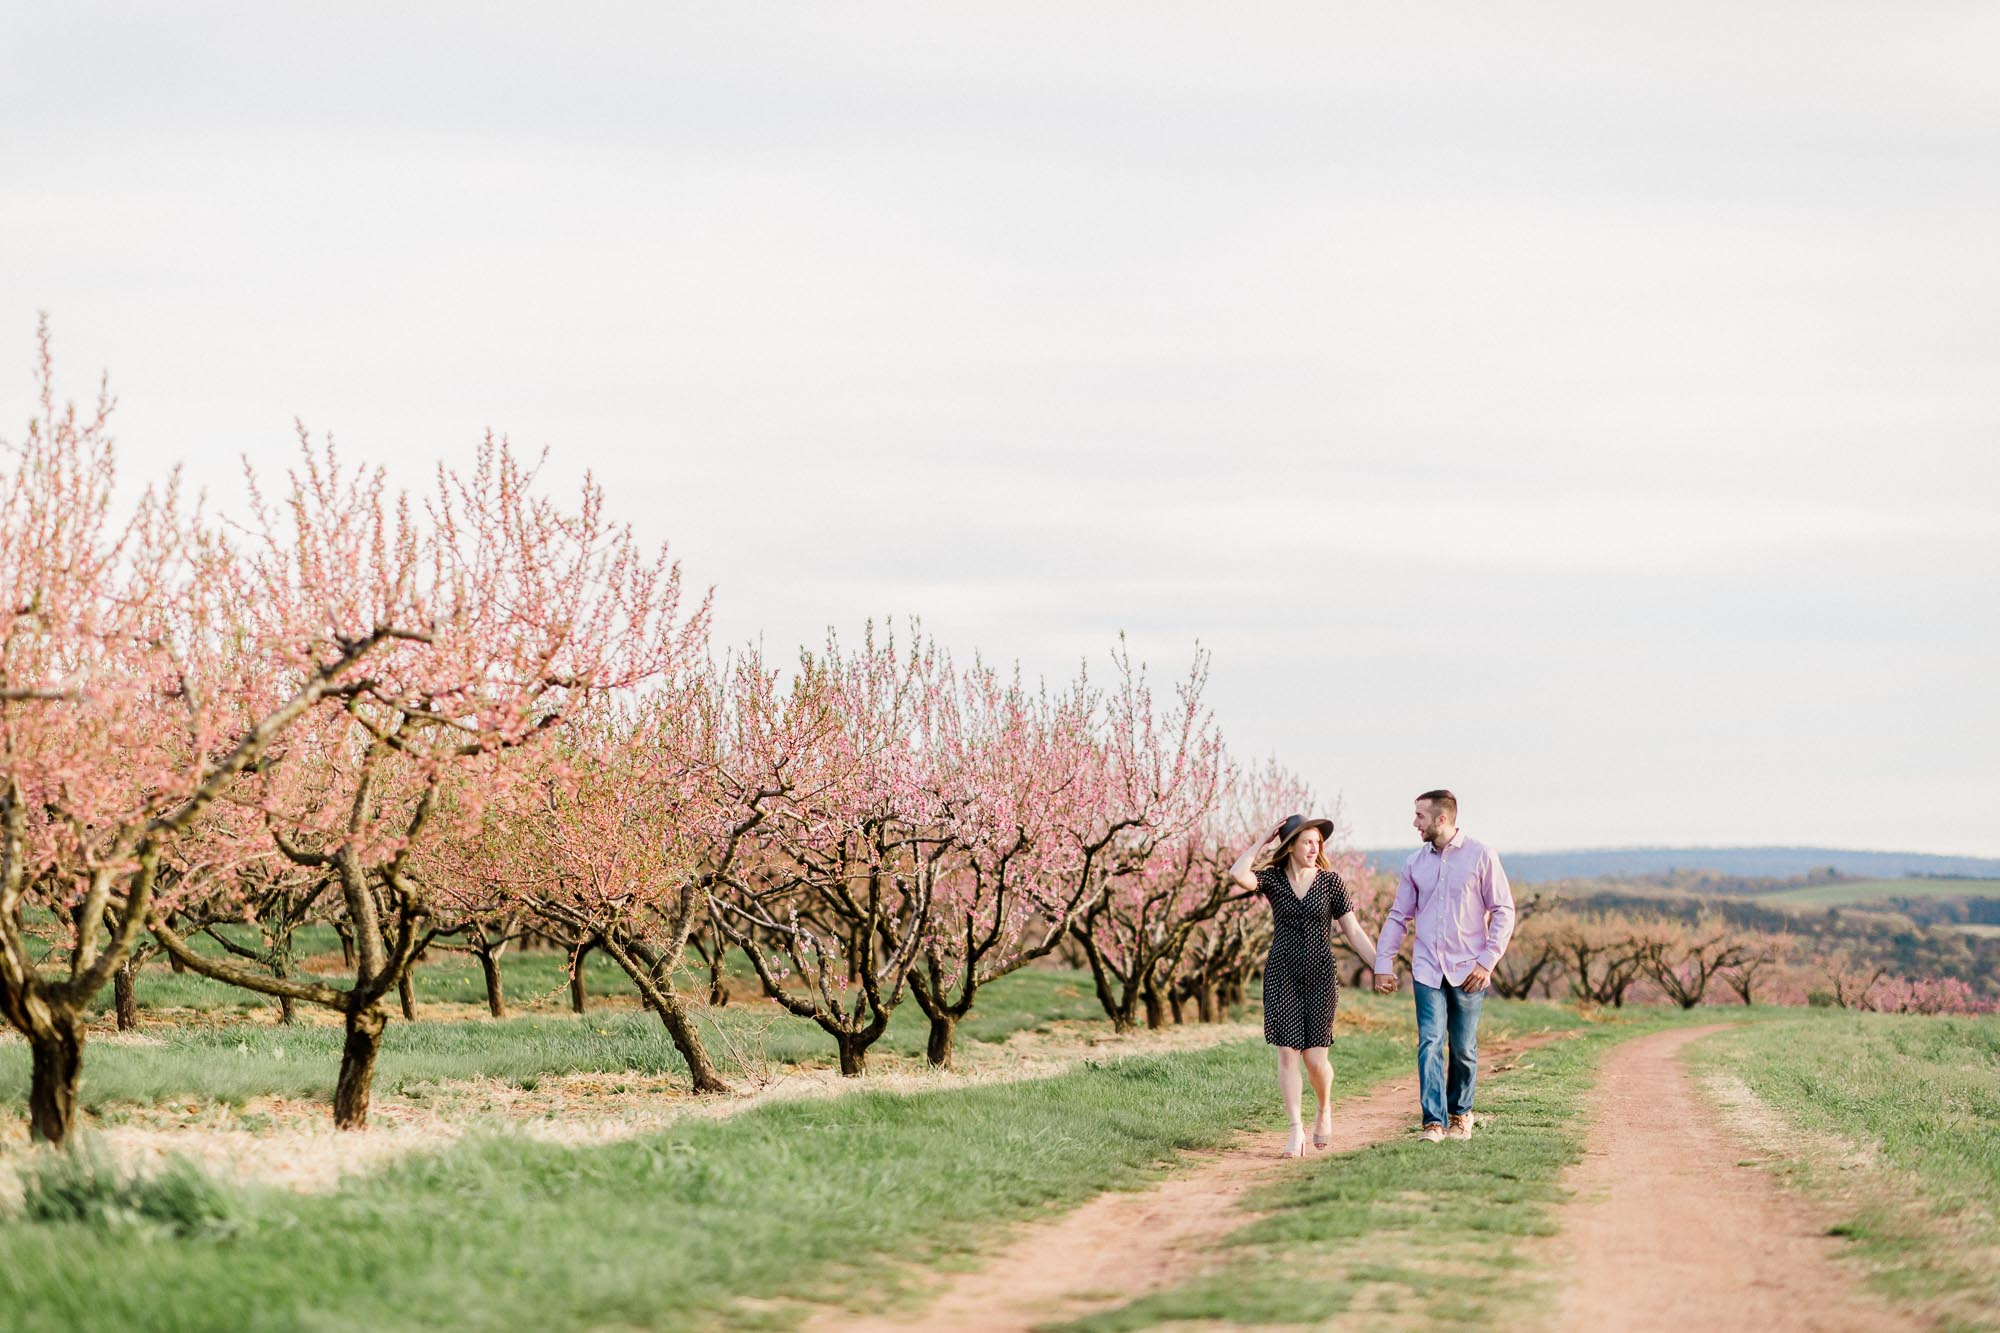 Rohrbachs-Spring-cherry-blossom-engagement-7414.jpg